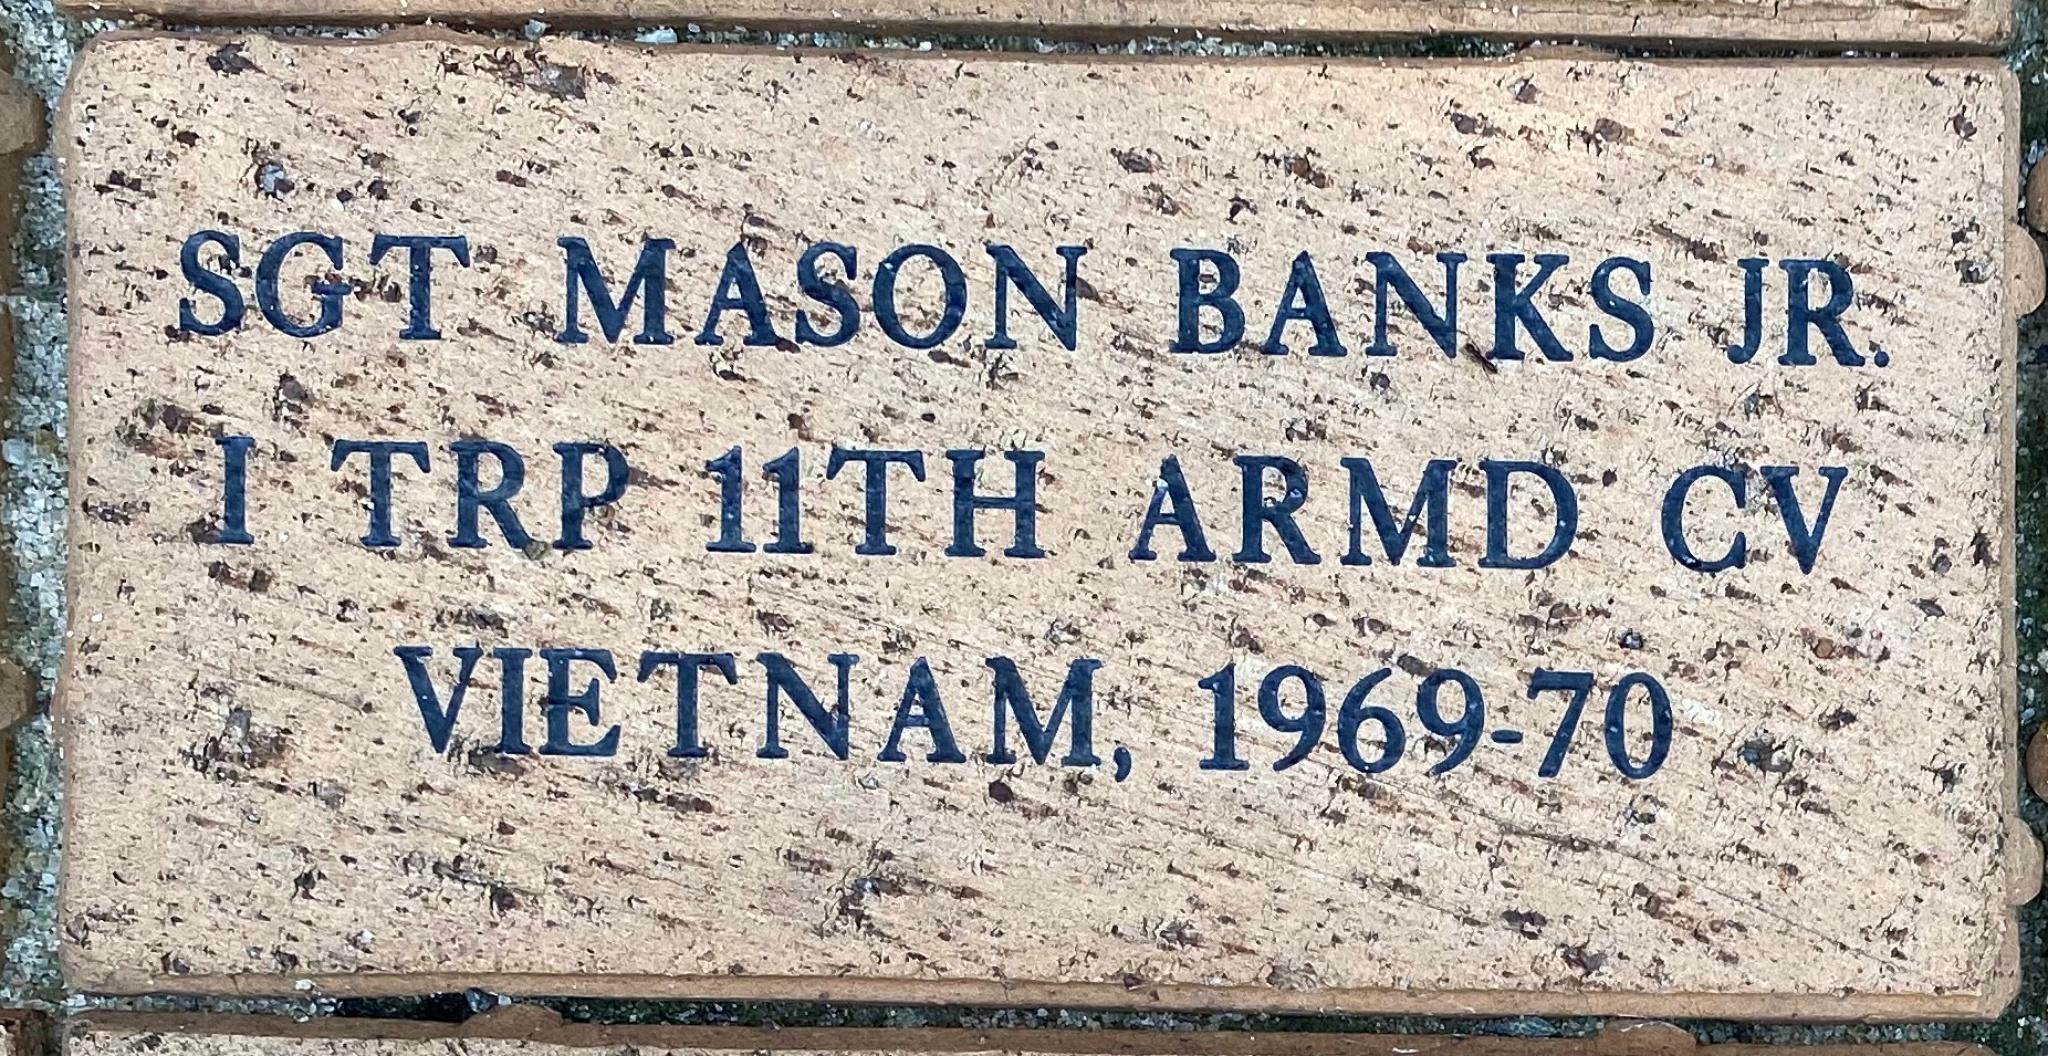 SGT. MASON BANKS, JR I TRP 11TH ARMD CAV VIETNAM, 1969-70